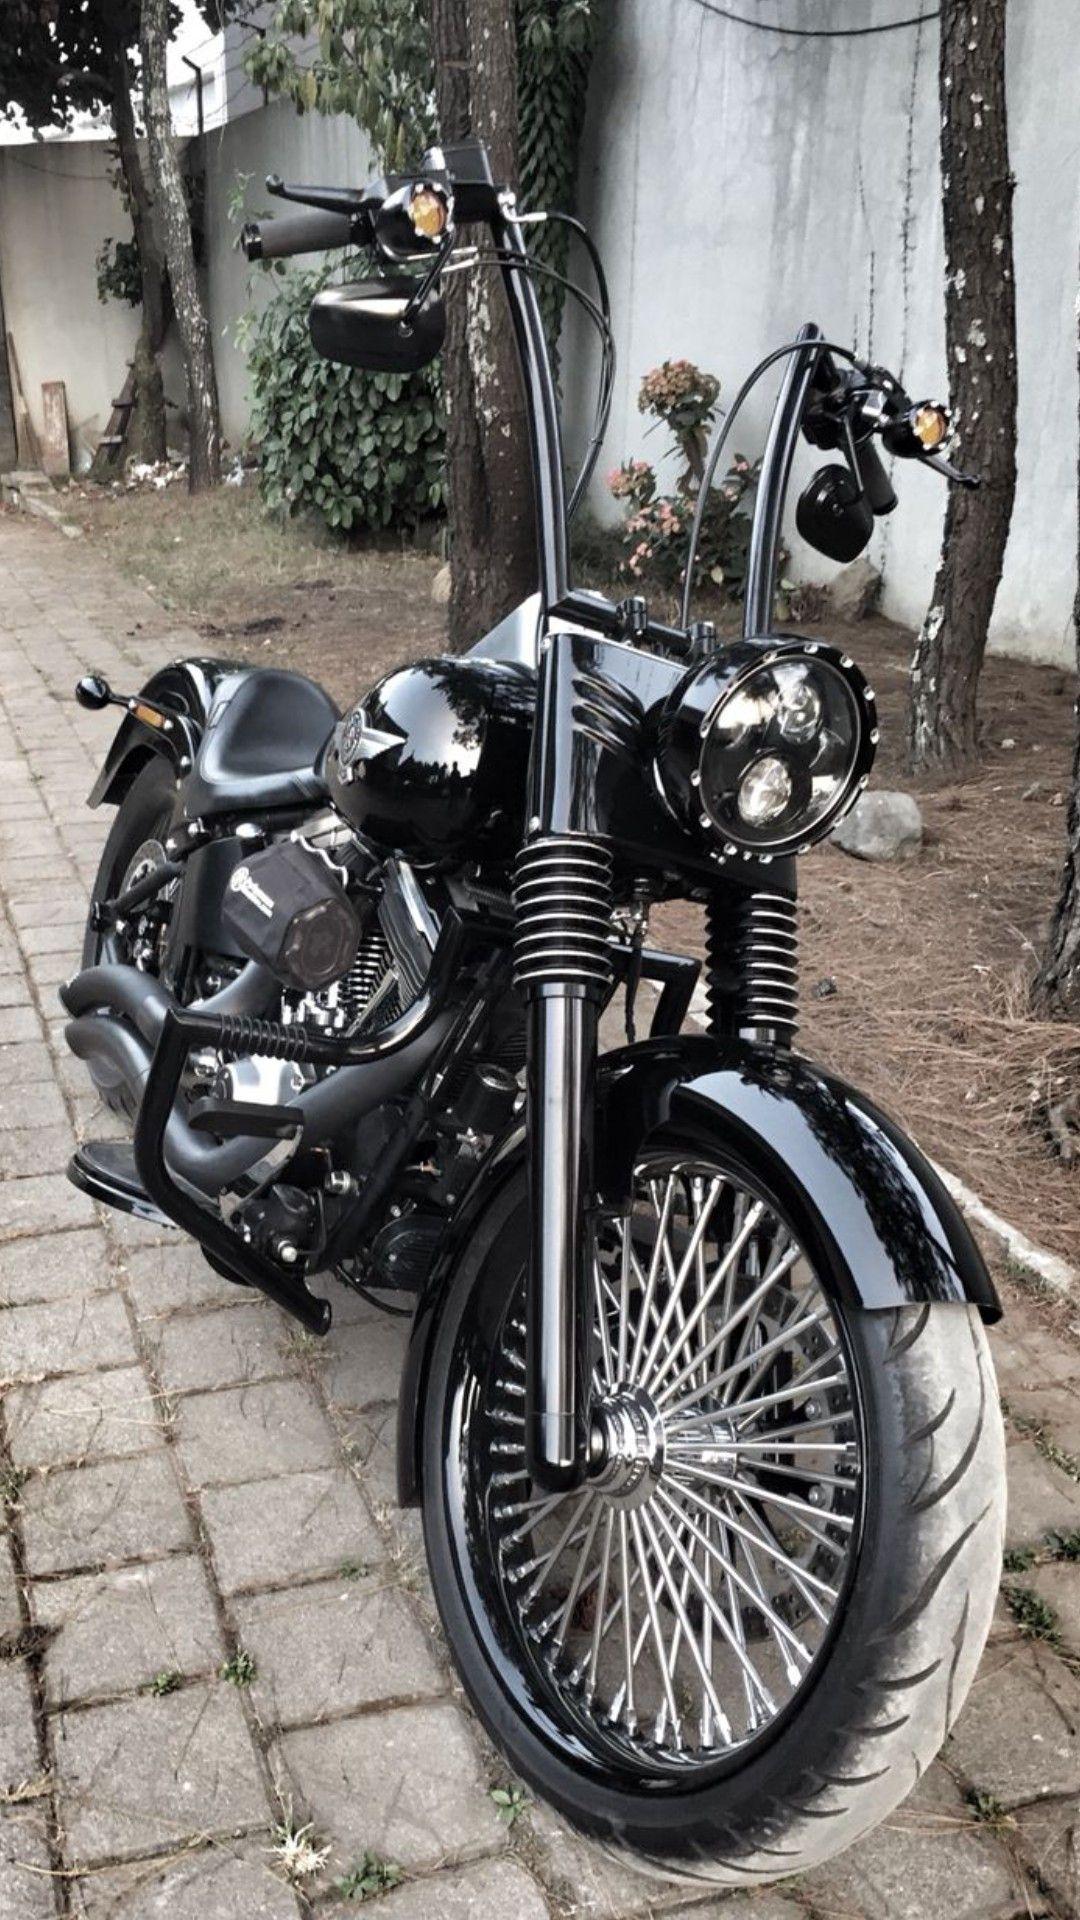 Harley Bobber Davidson Motorcycles Fatboy Custom Bikes Pictures Harleys